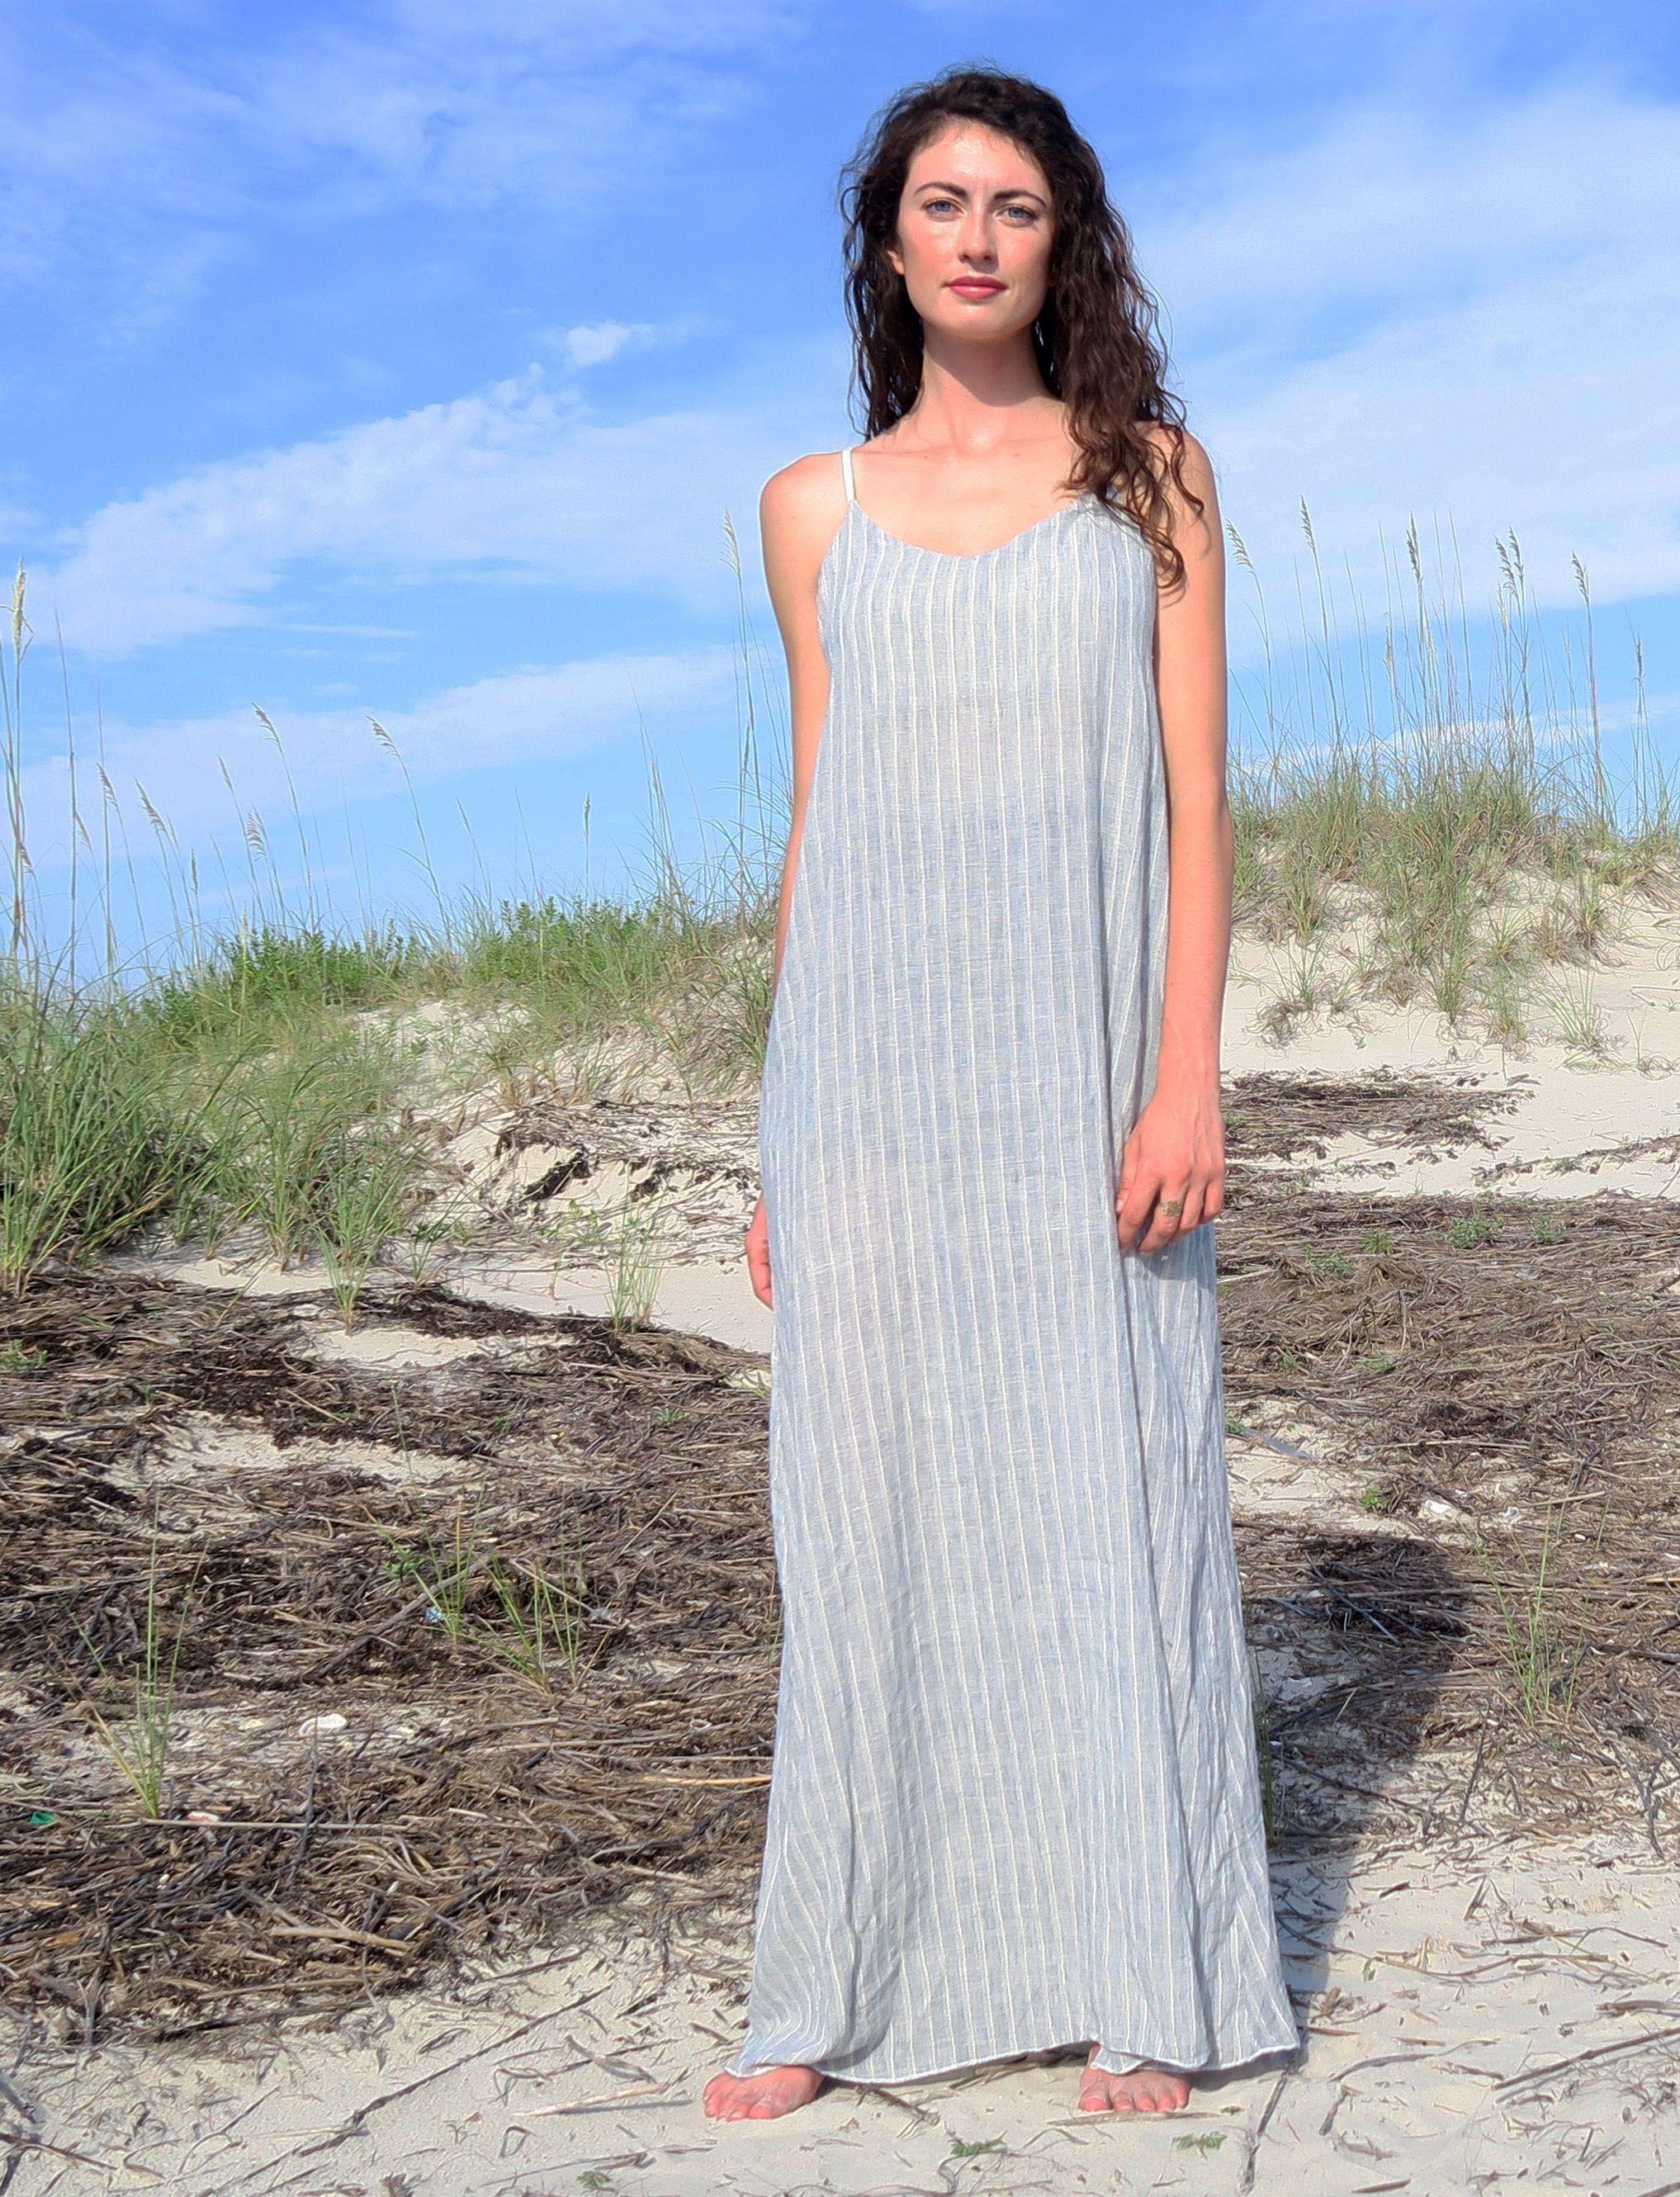 Adjustable Strap Built In Bra Ojai Long Dress Gaia Conceptions Long Dress Dresses Fashion [ 2661 x 2035 Pixel ]